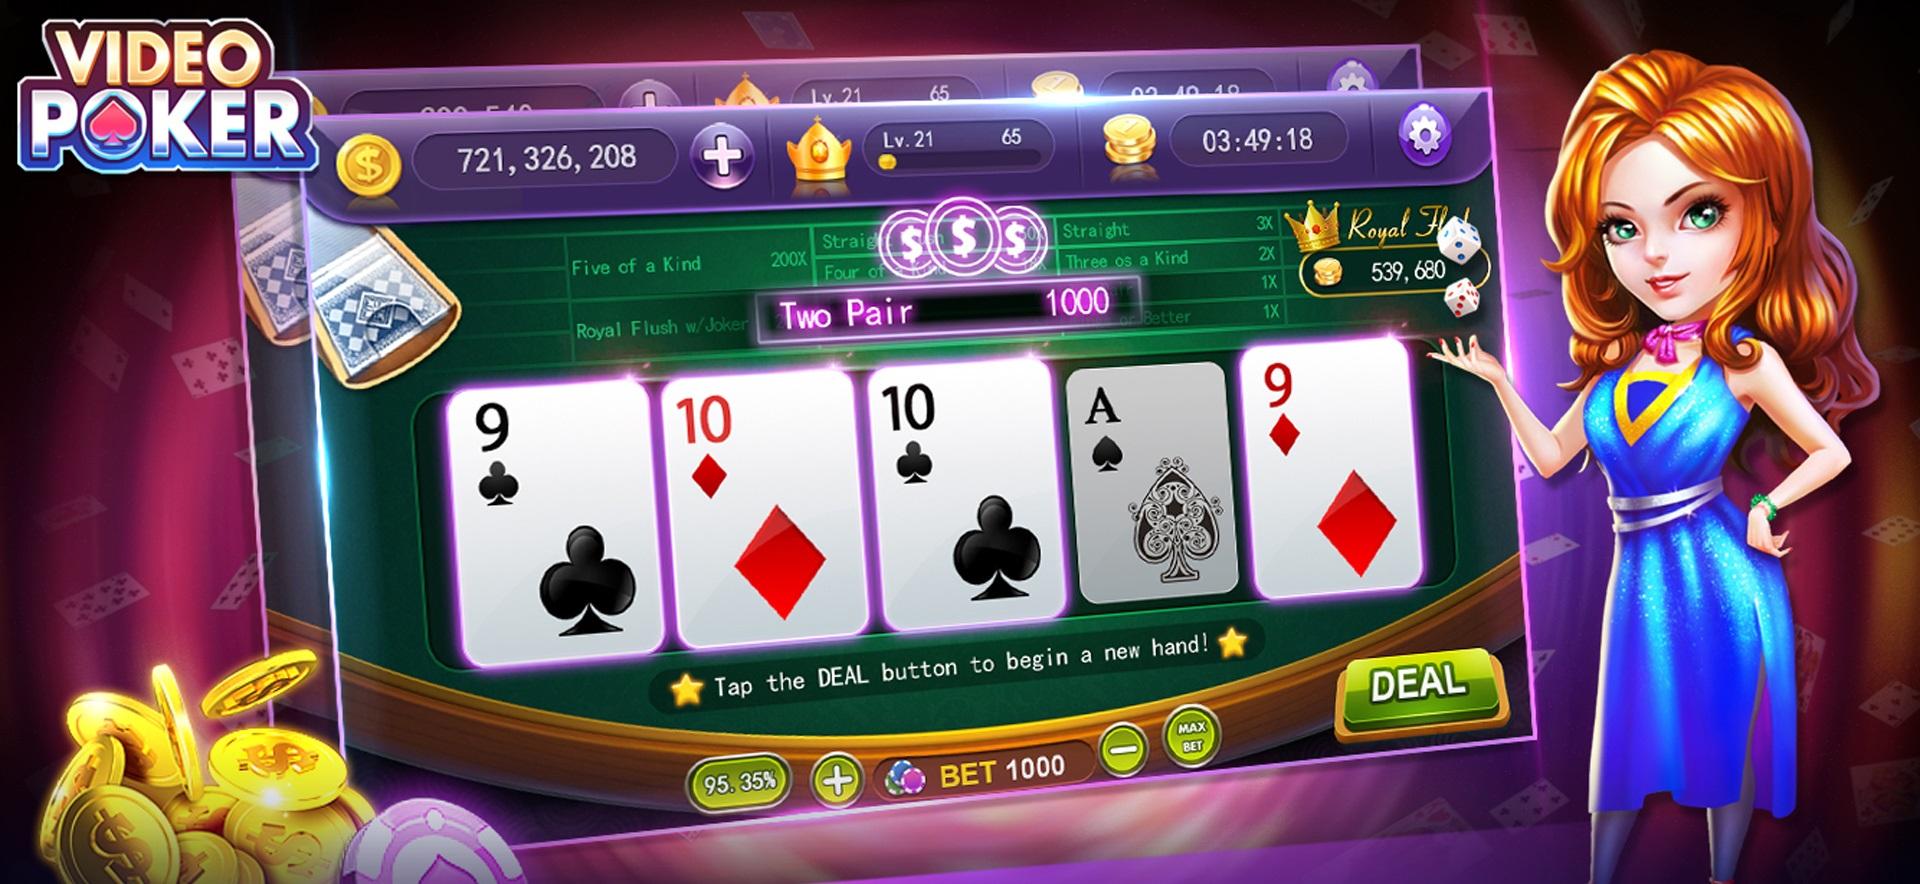 Video poker strategies